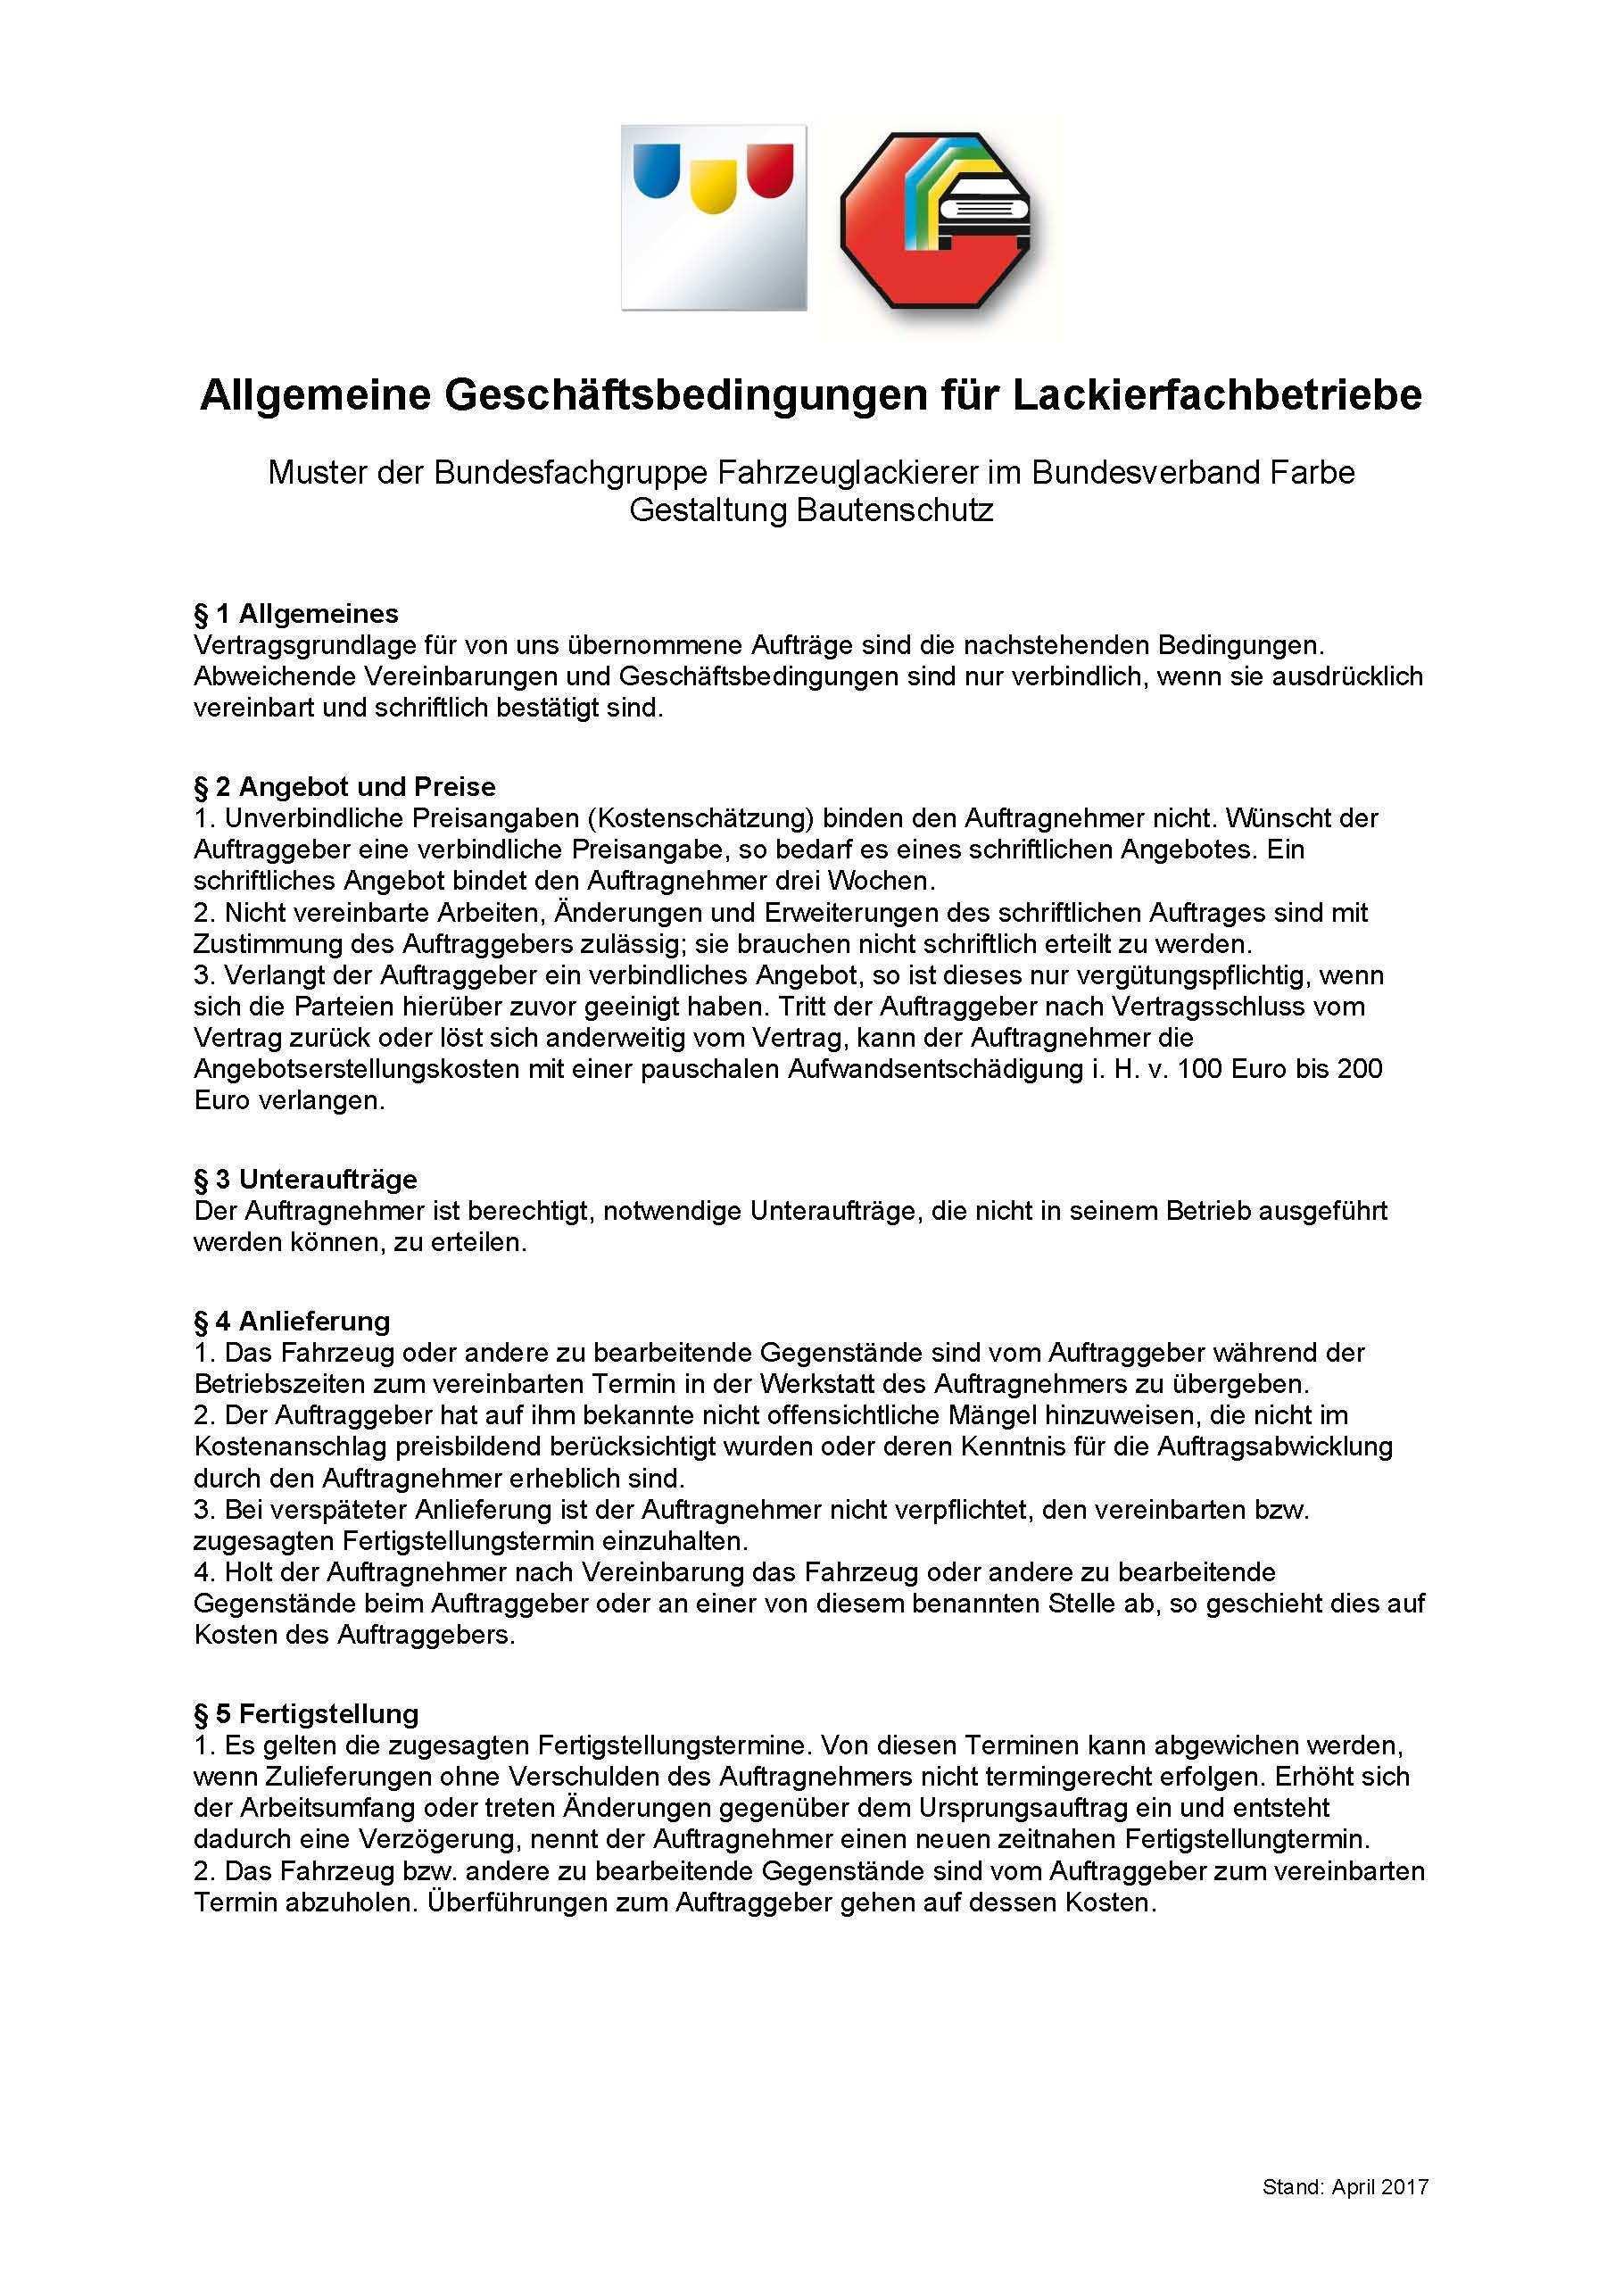 Agb Fur Lackierfachbetriebe Uberarbeitet Stand April 2017 Bundesverband Farbe